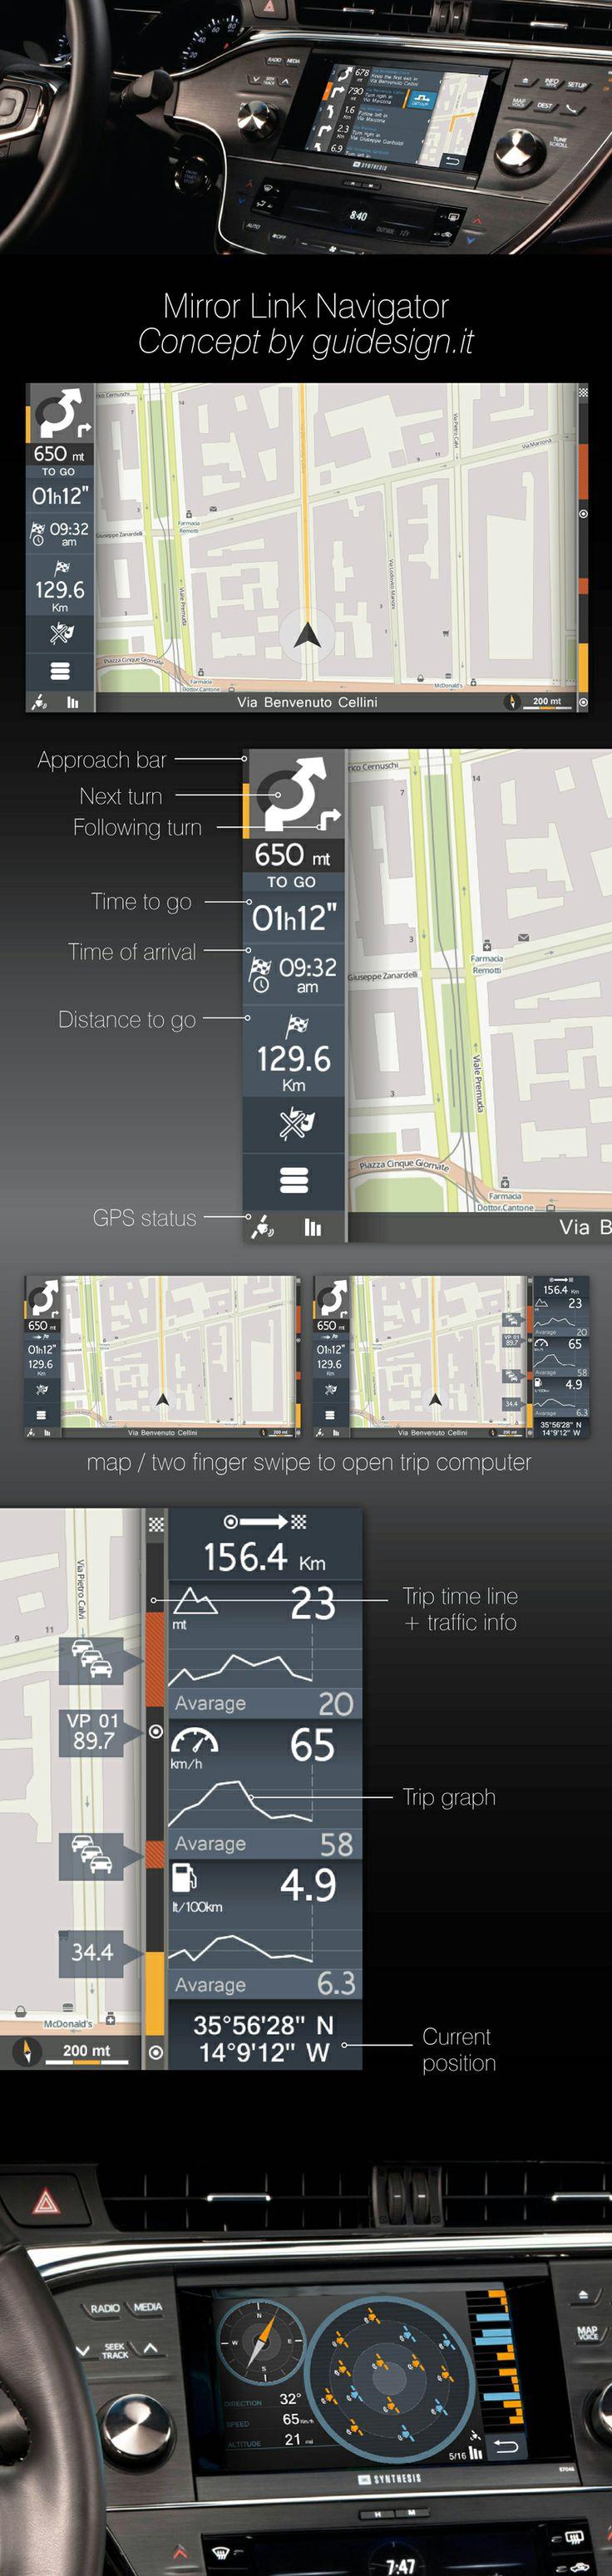 concept UI in-car navigator  | guidesign.it